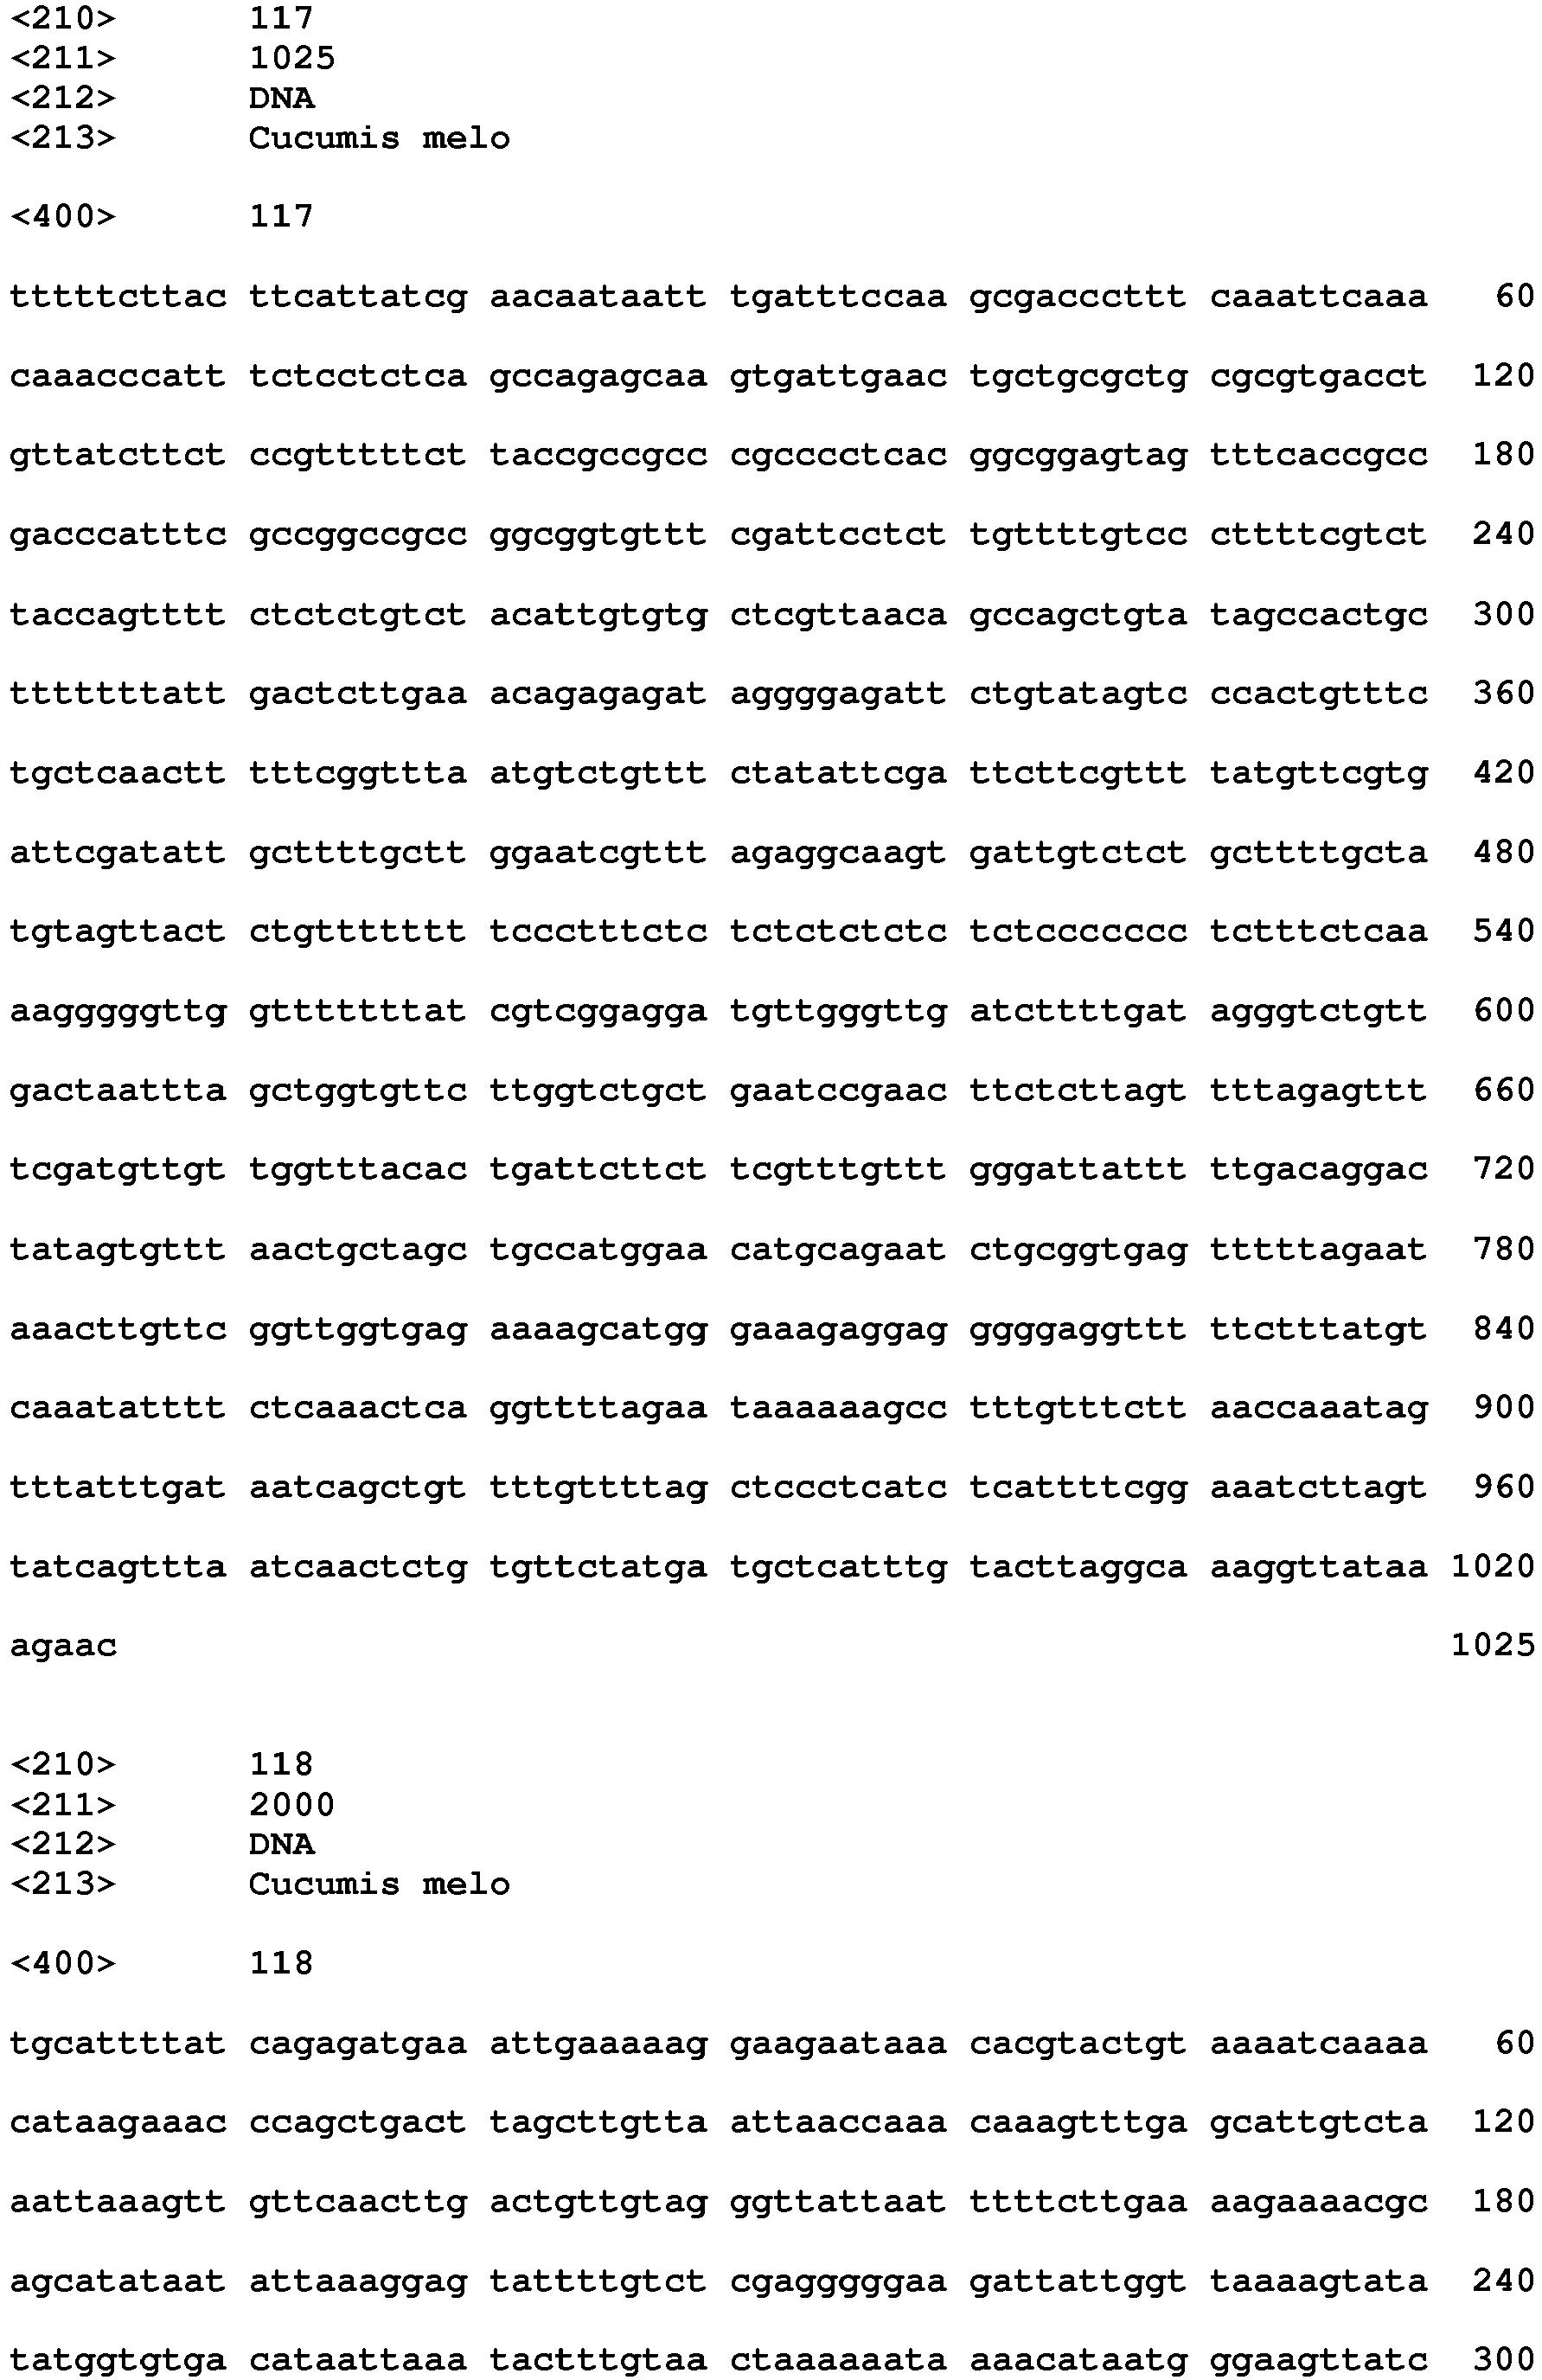 Figure imgb0147